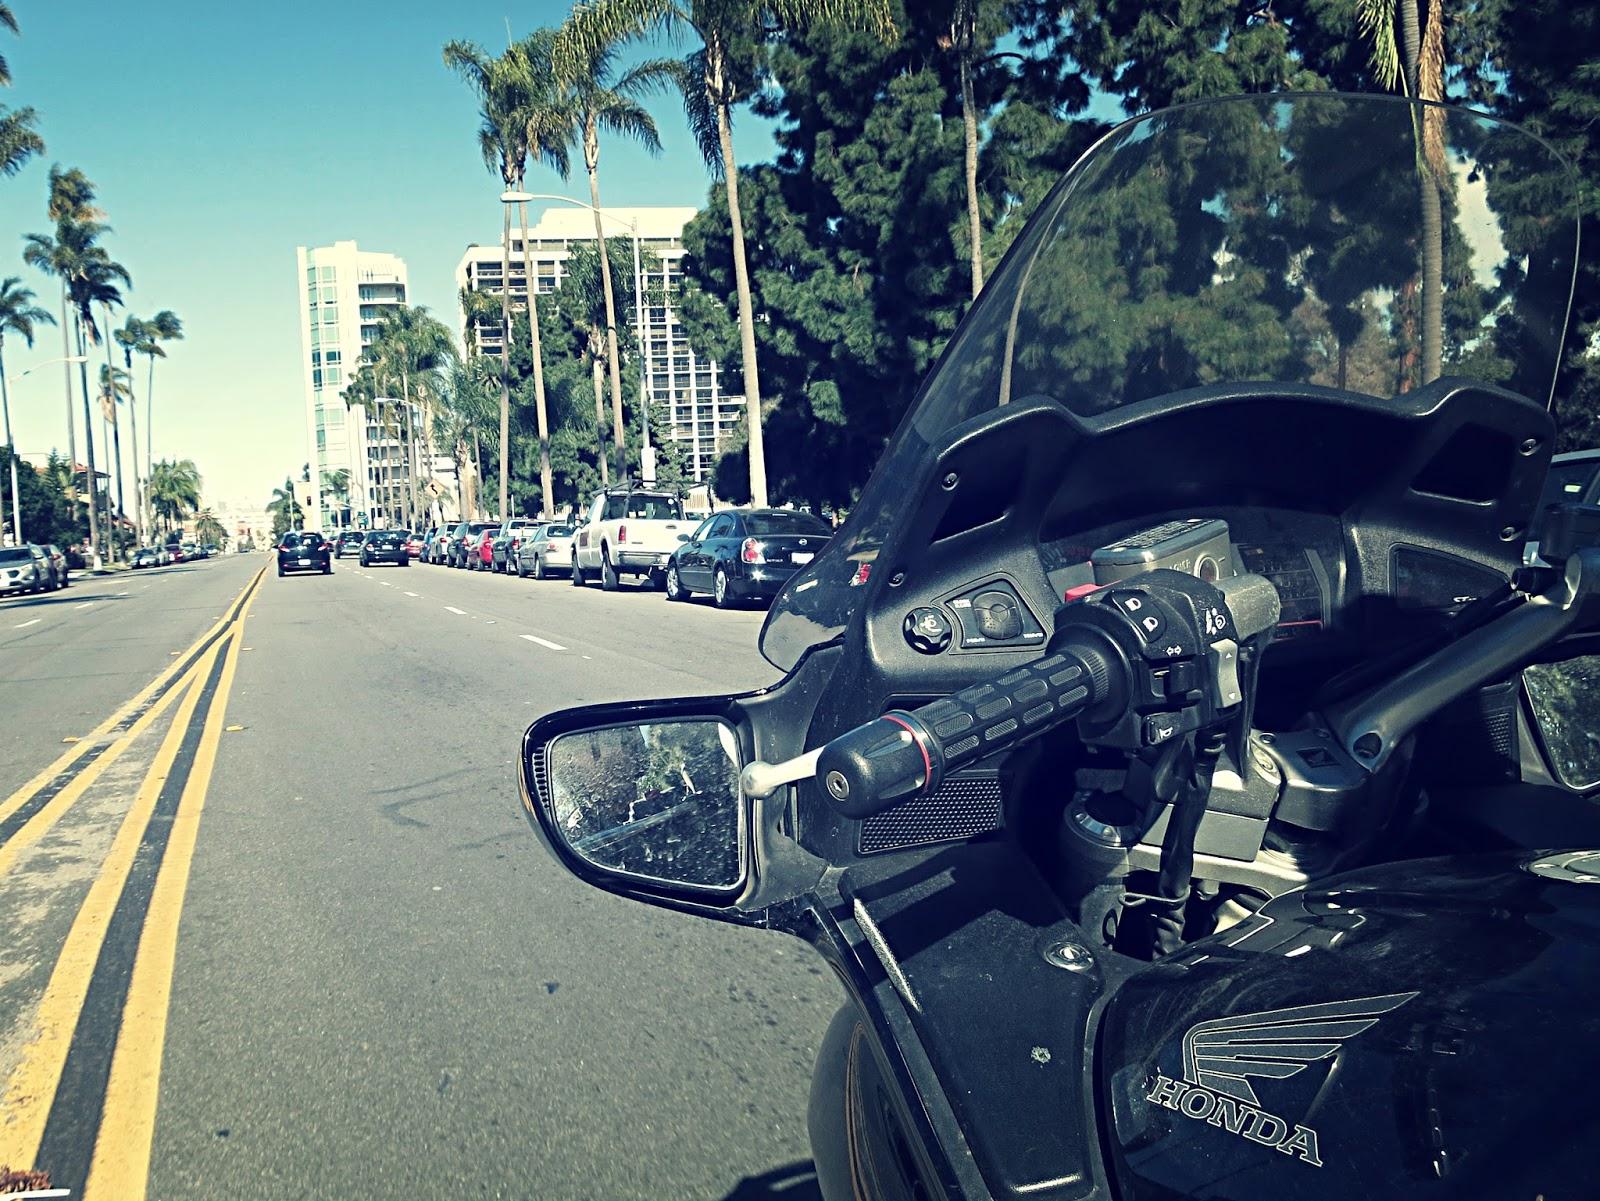 san diego motorcycle